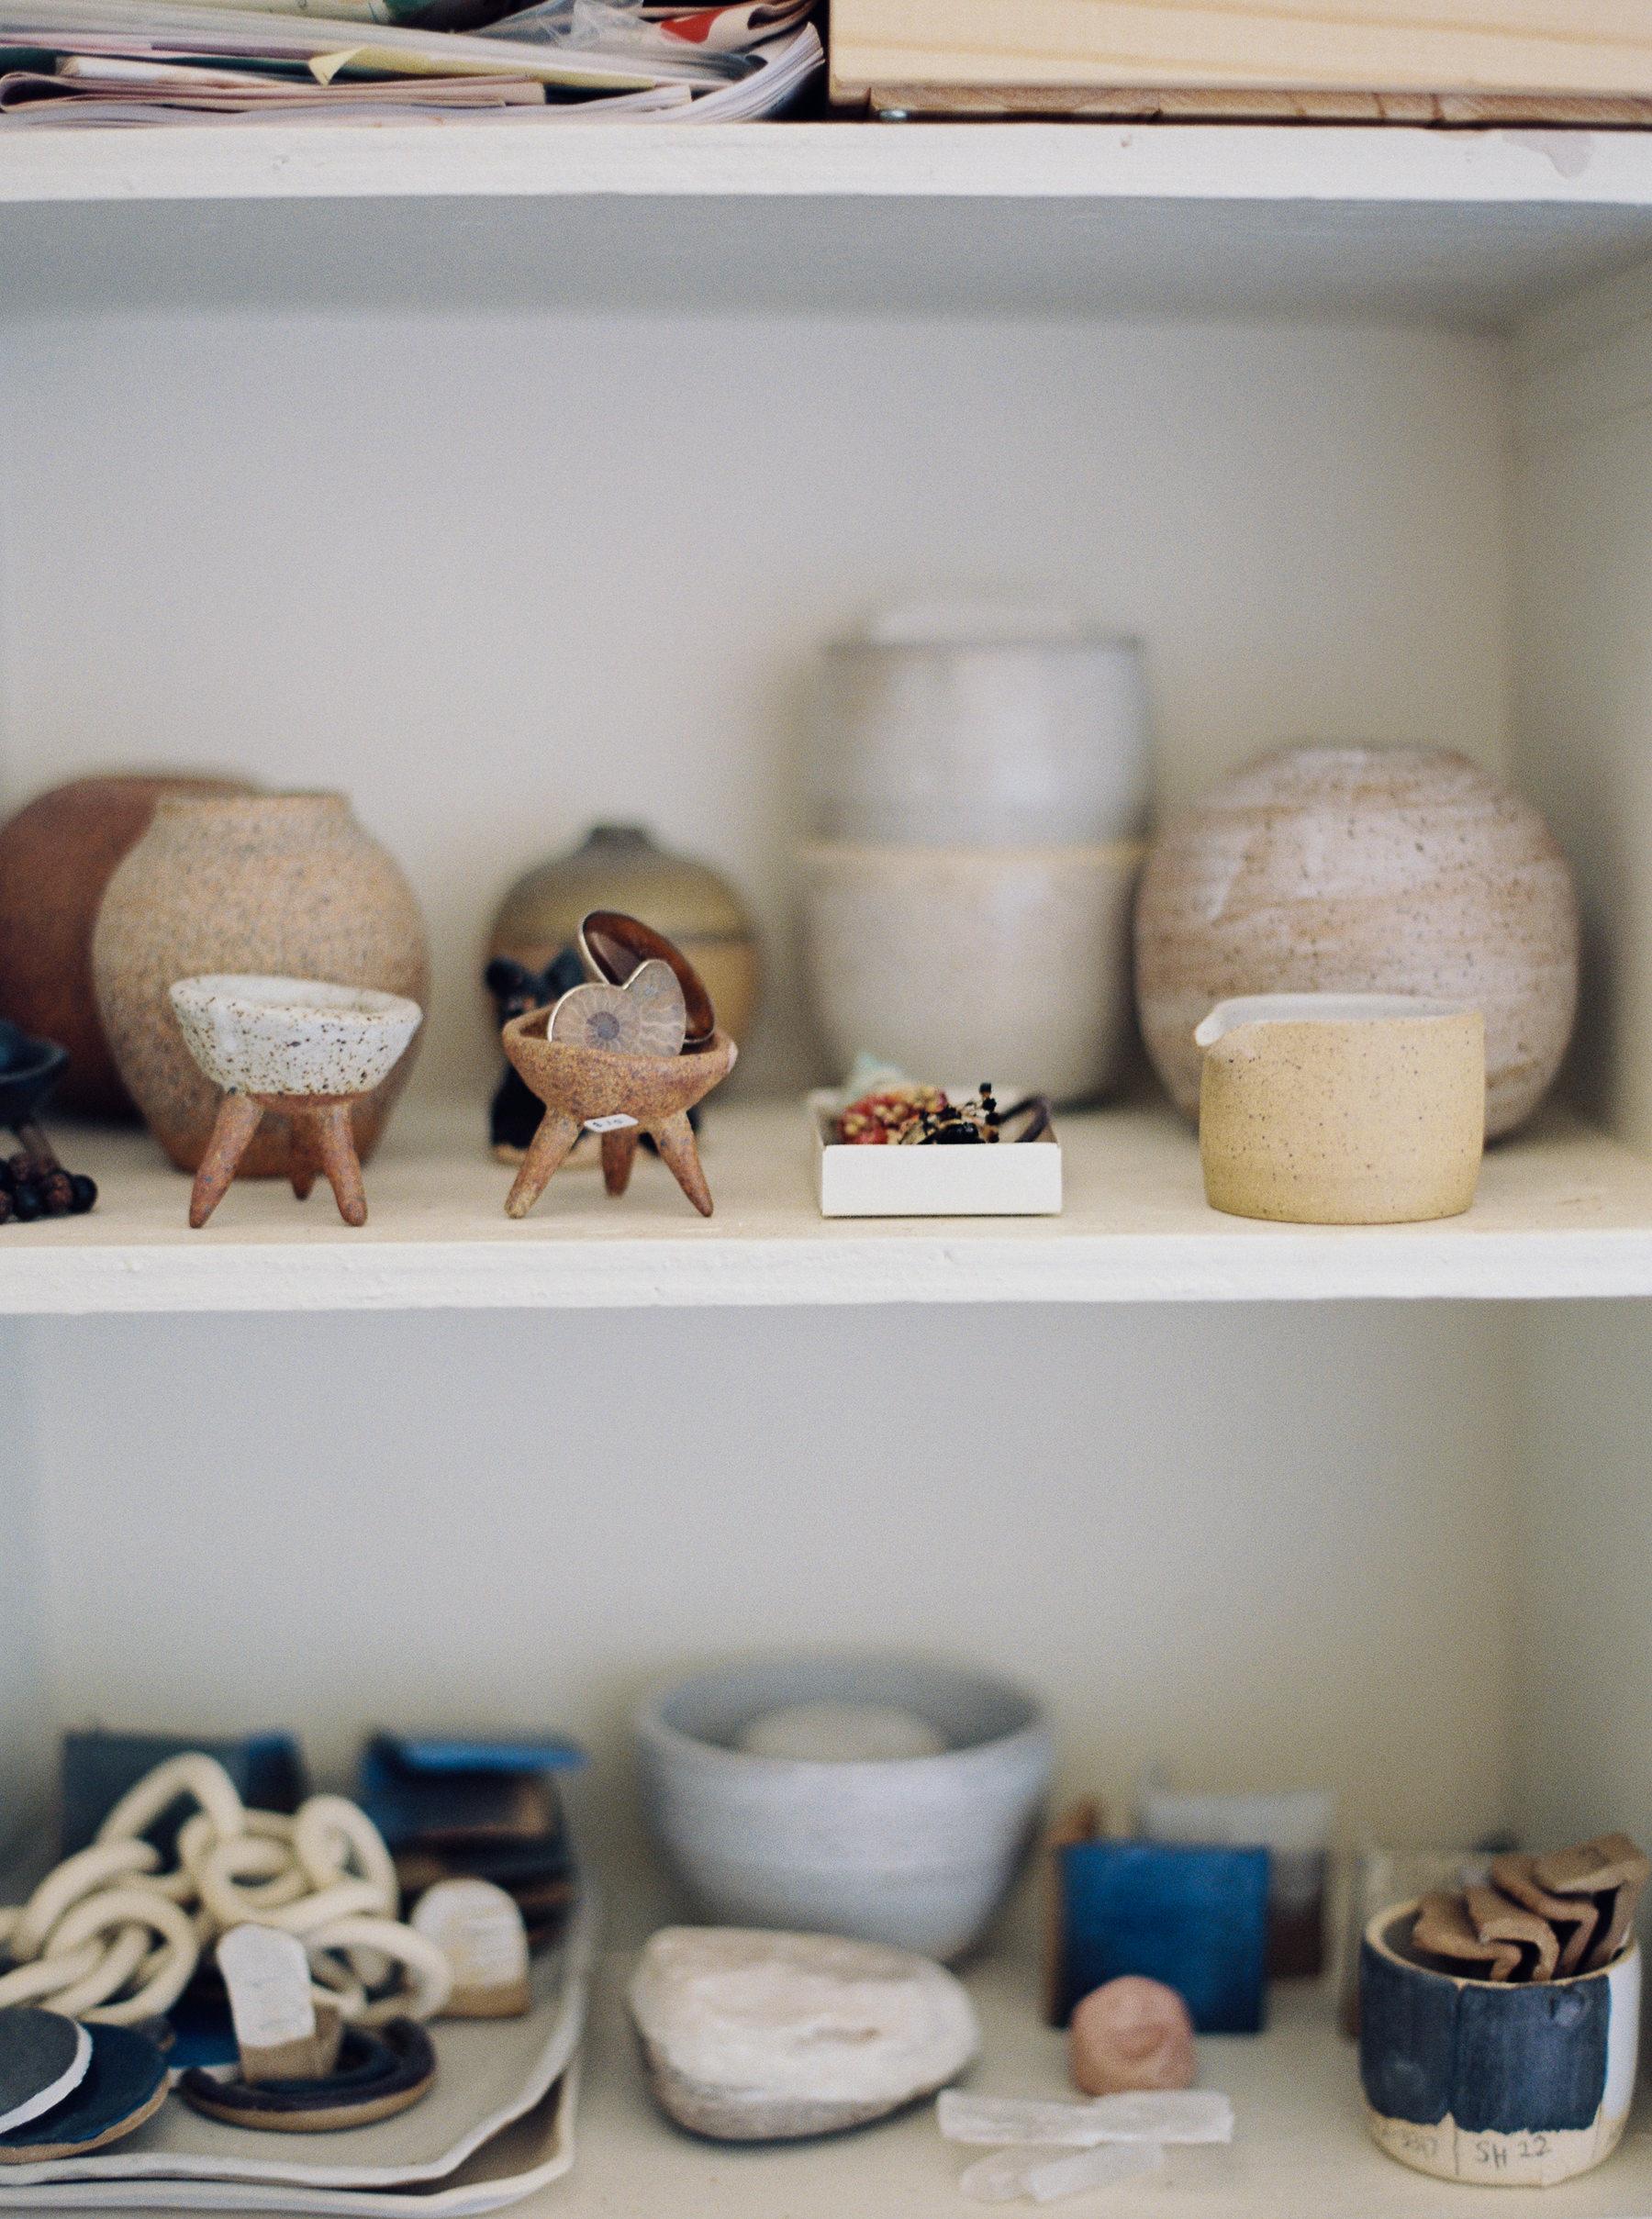 artistprofile-katherinemoes-pottery-annapeters-annapetersphoto-unearthing.tc-6.jpg